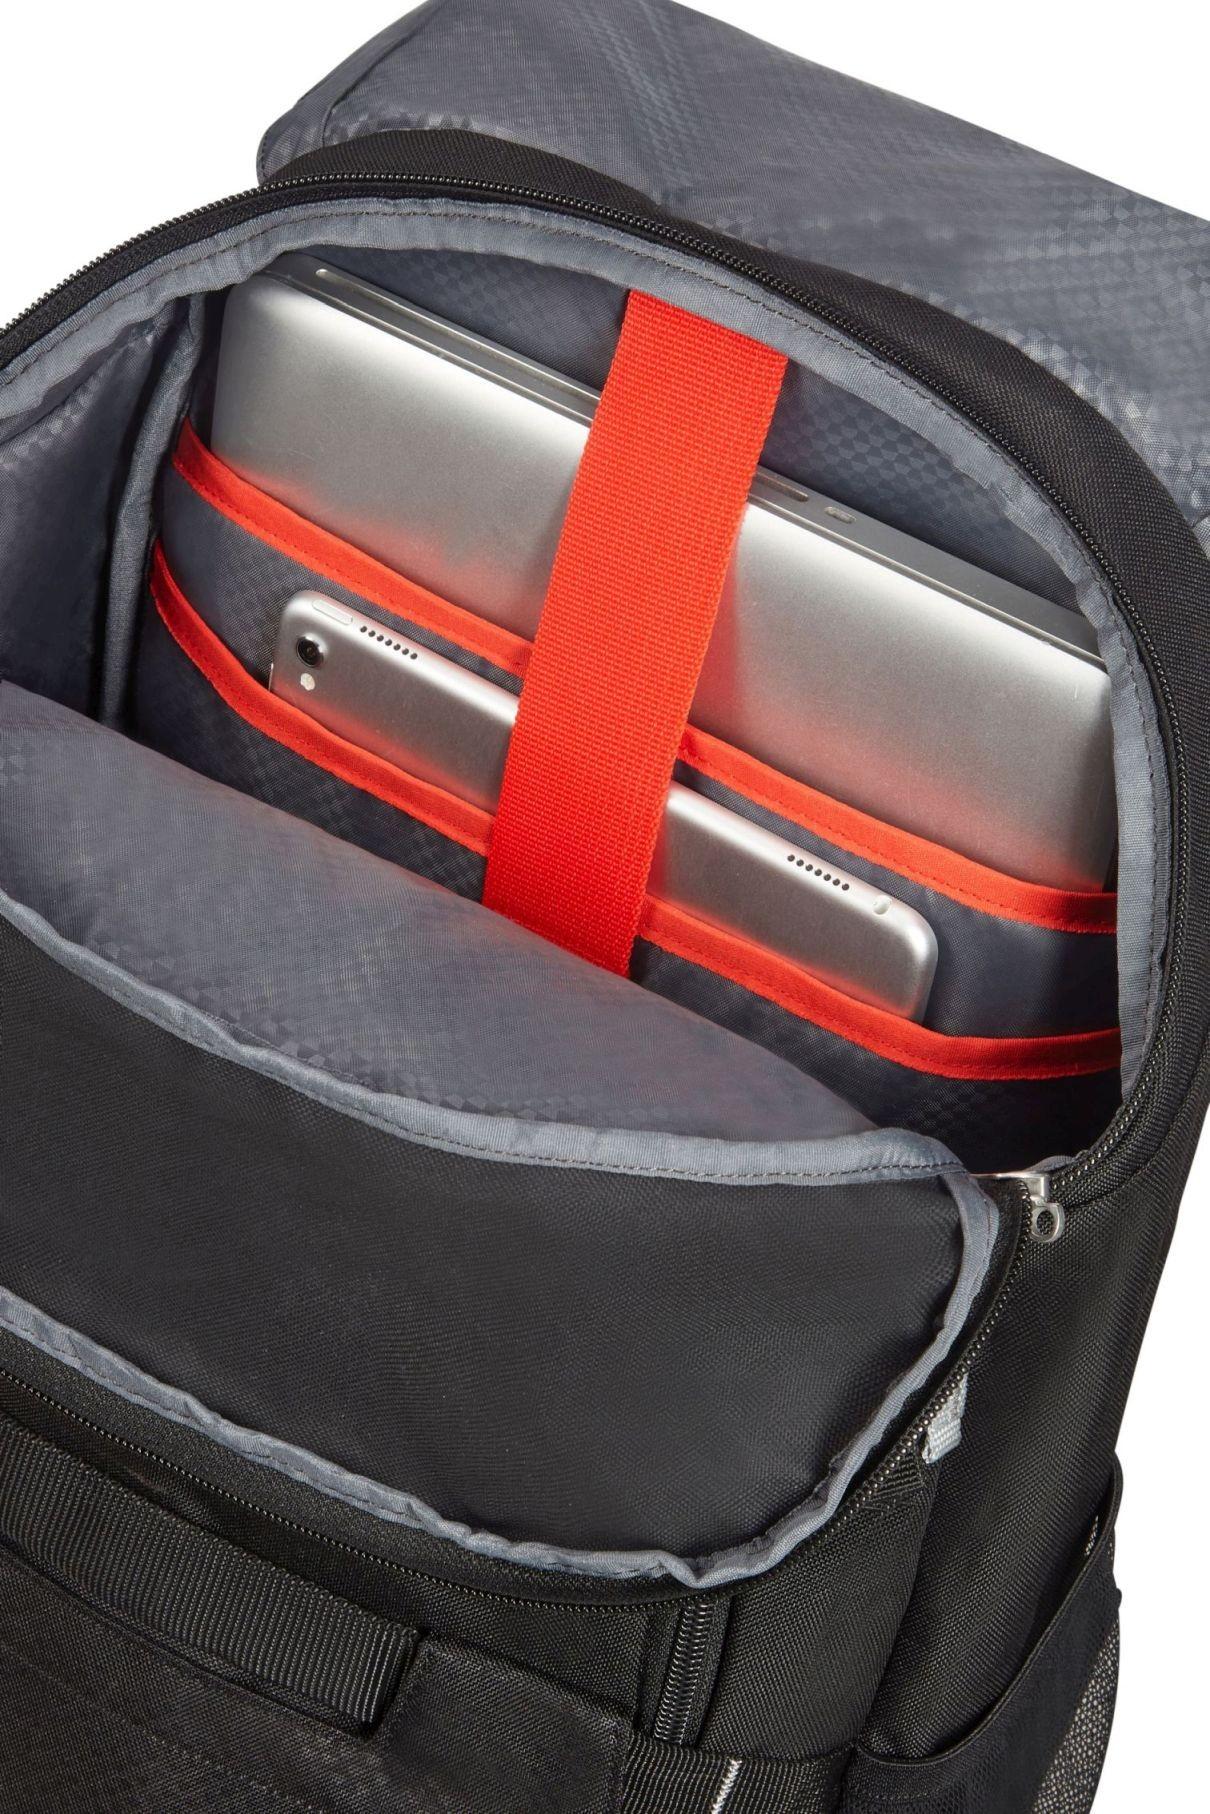 Samsonite Sonora Laptop Backpack M, View 3